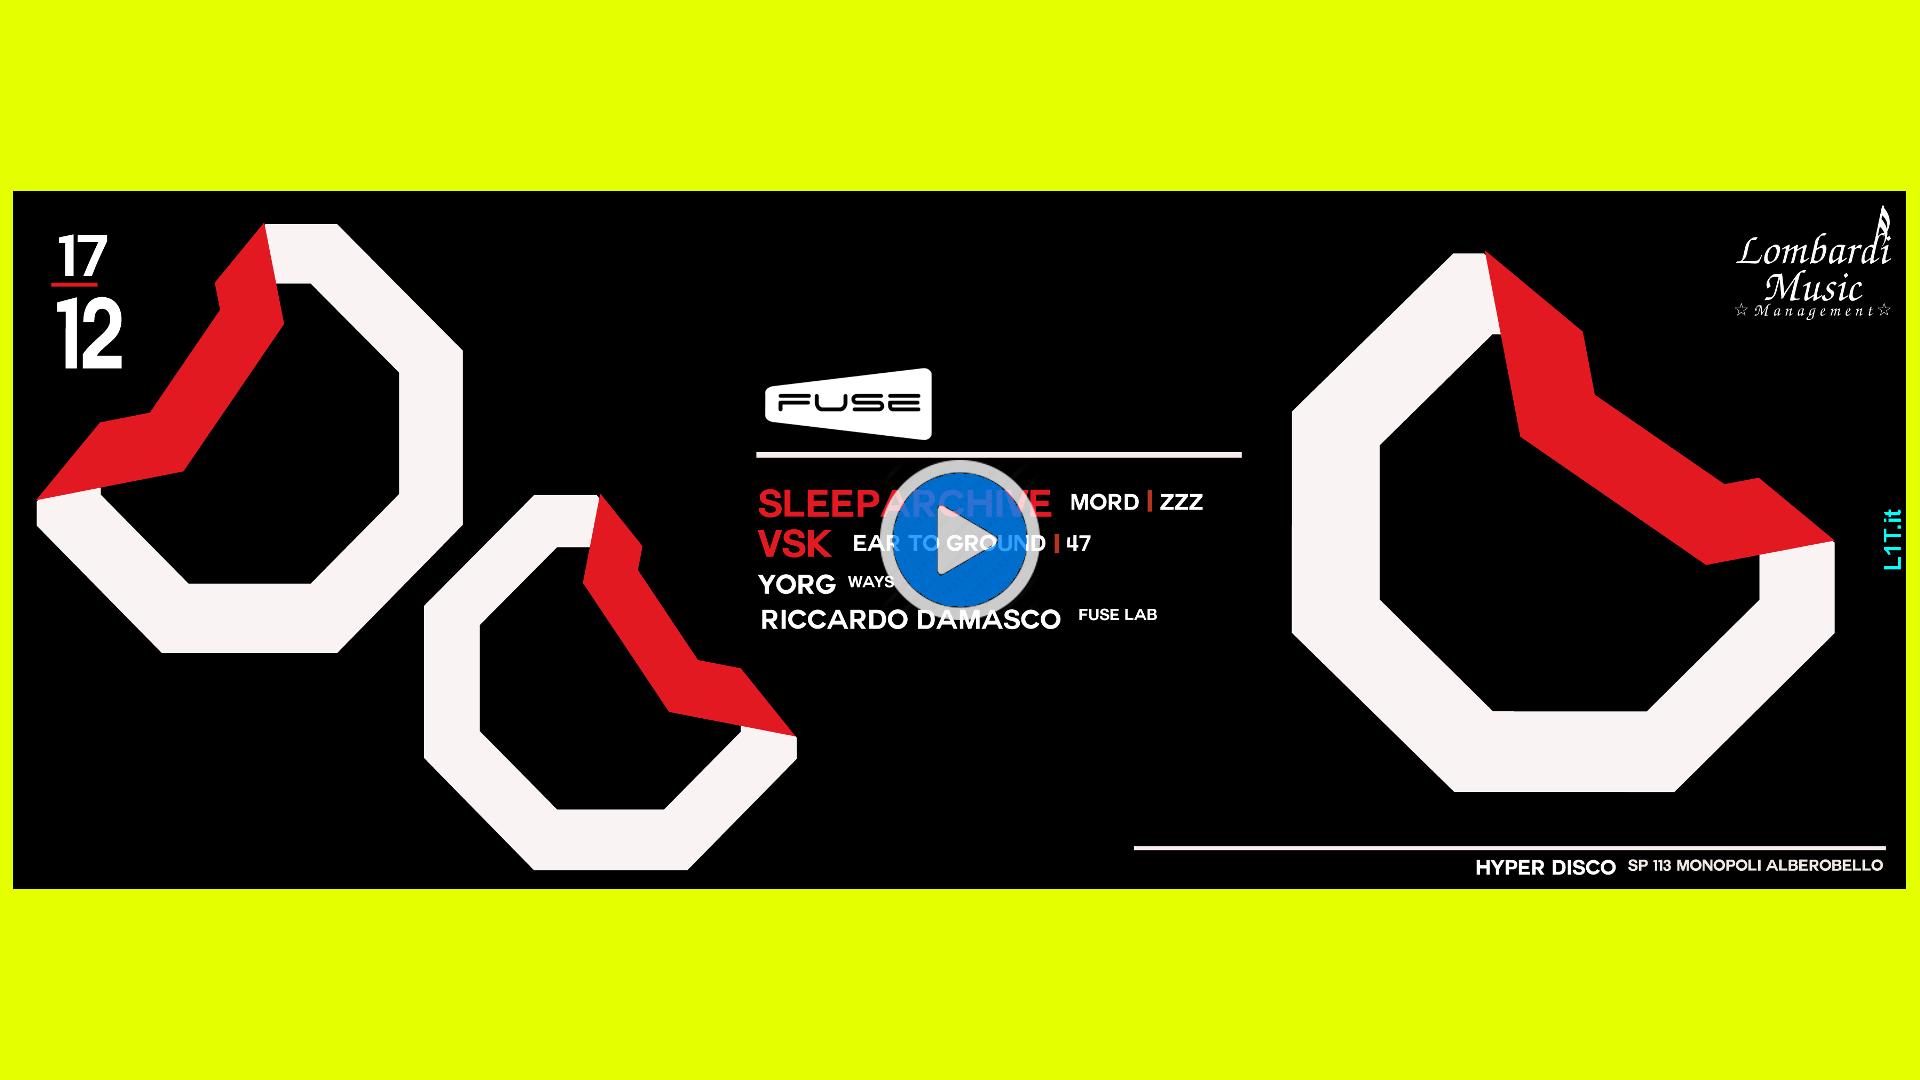 Fuse Sleeparchive VSK Hyper